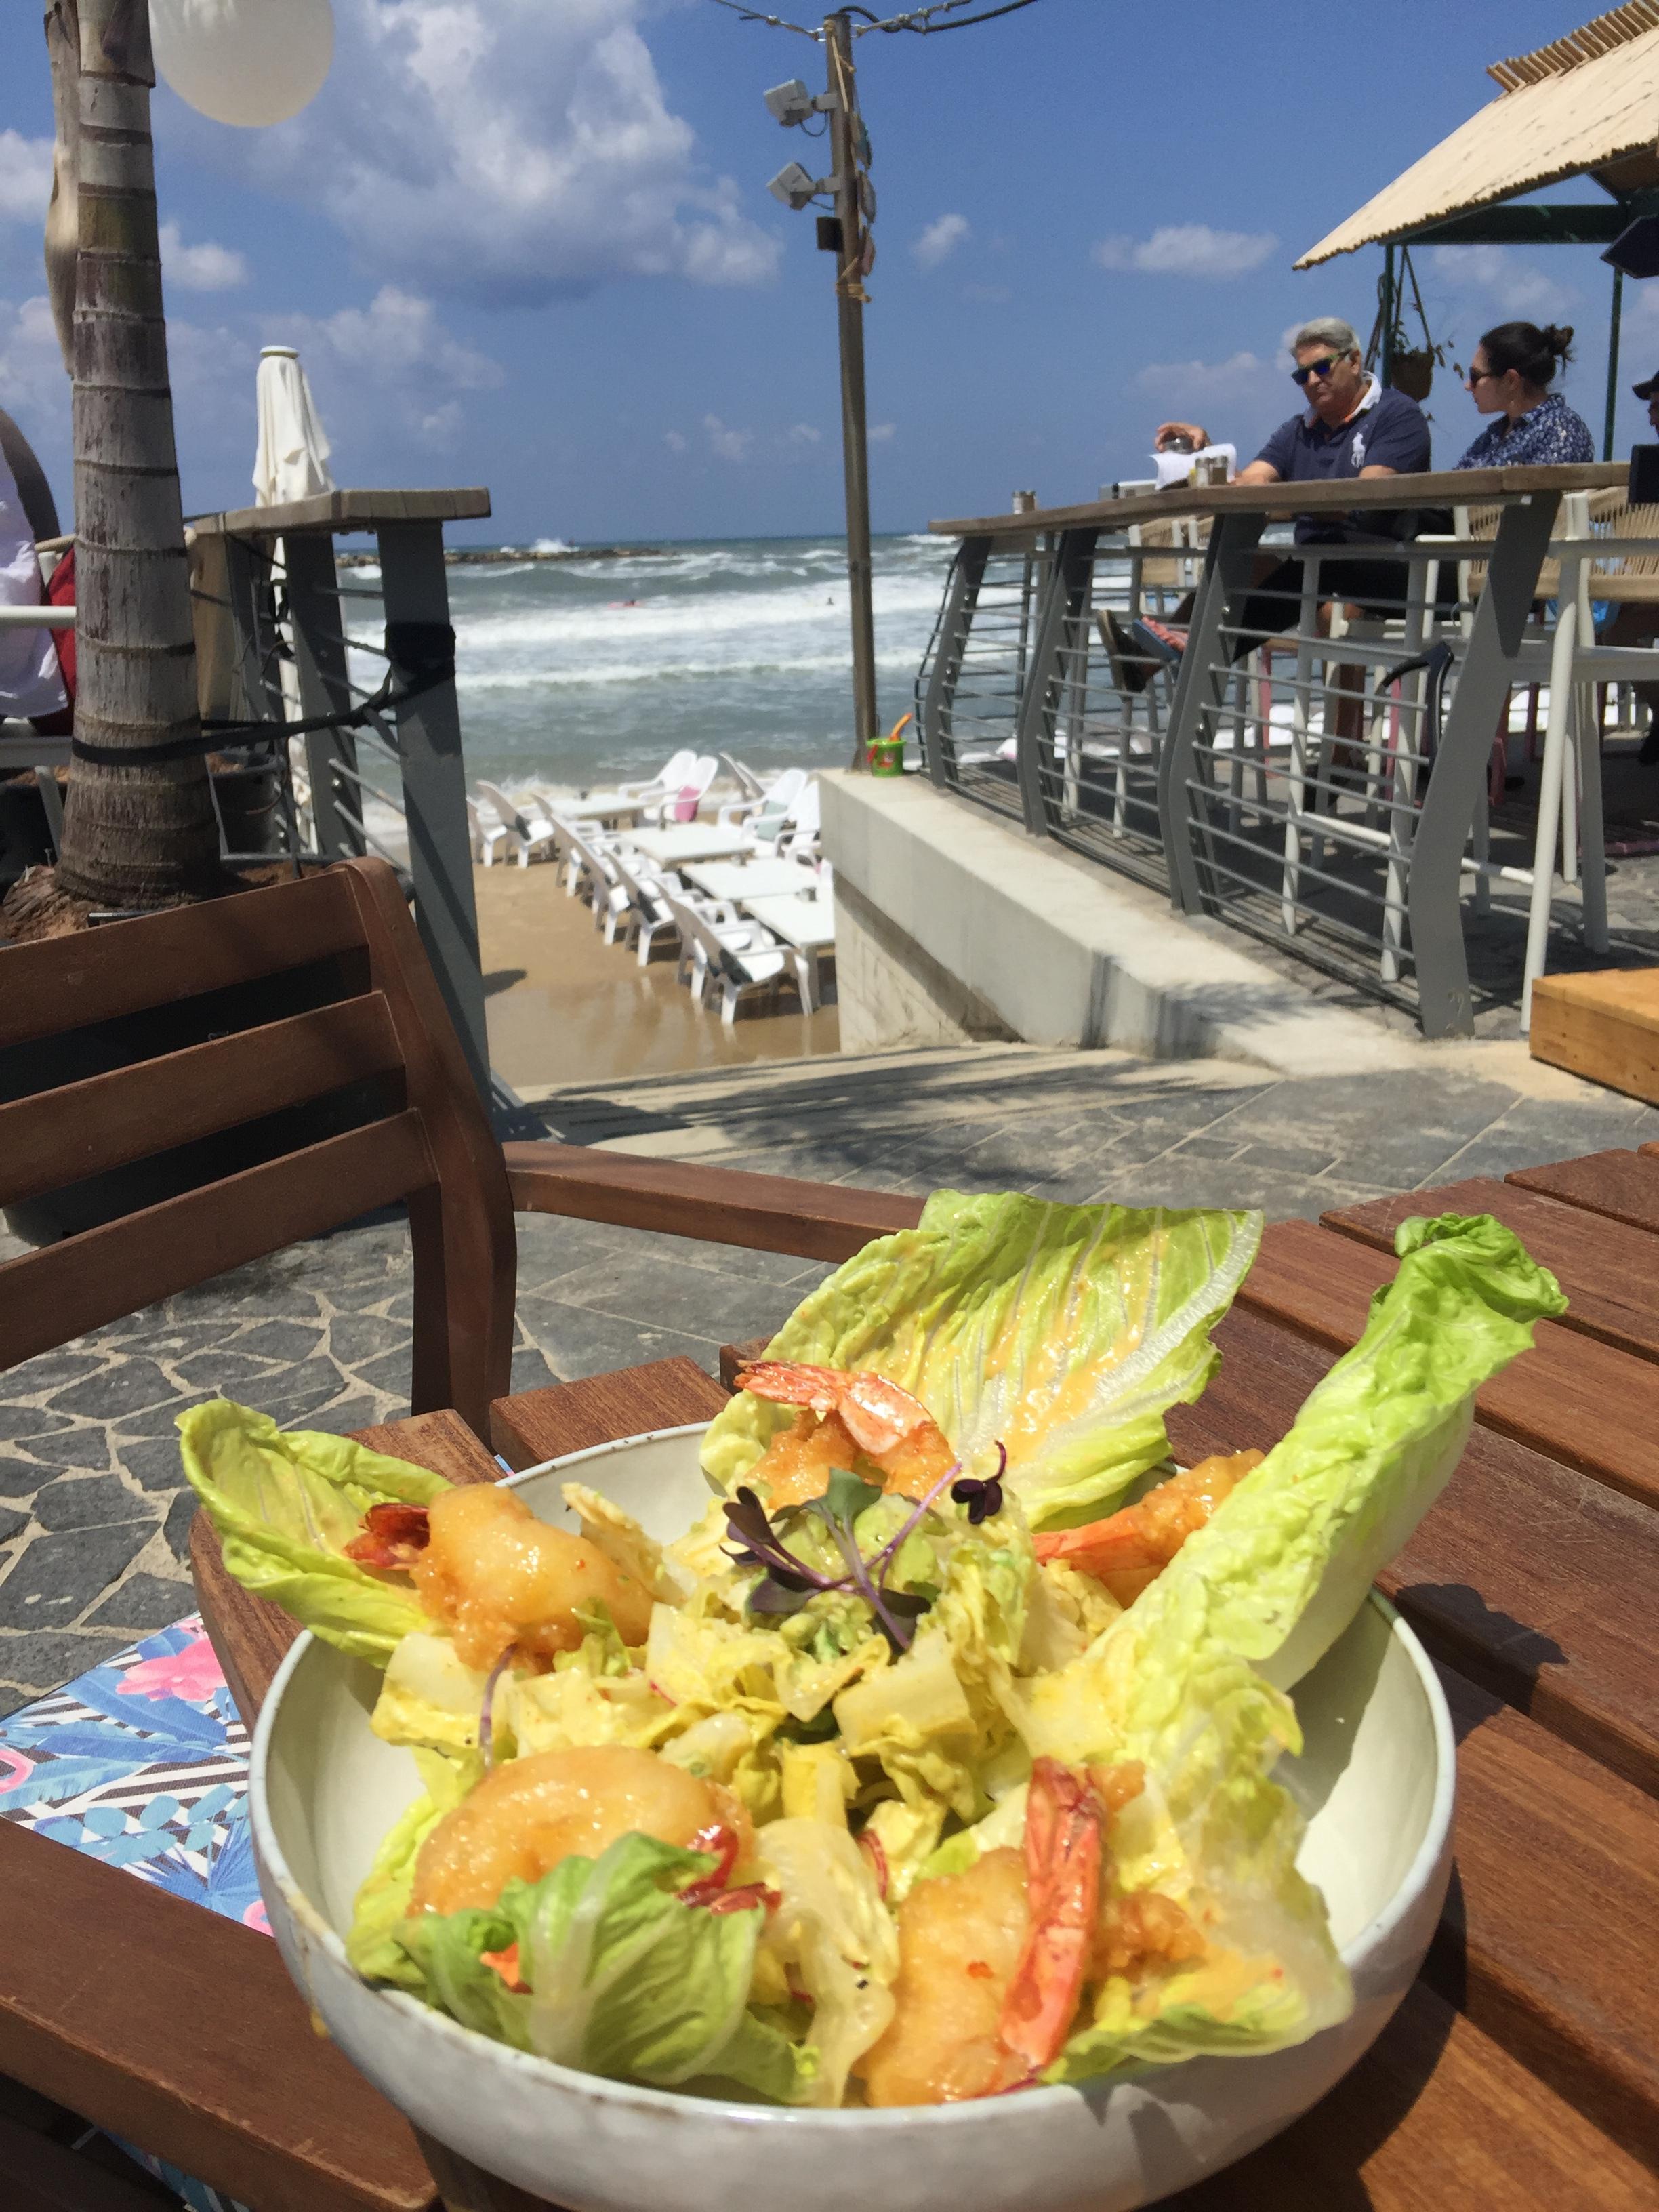 The Japanese Caesar Salad at said random surf bar we kept going back for.